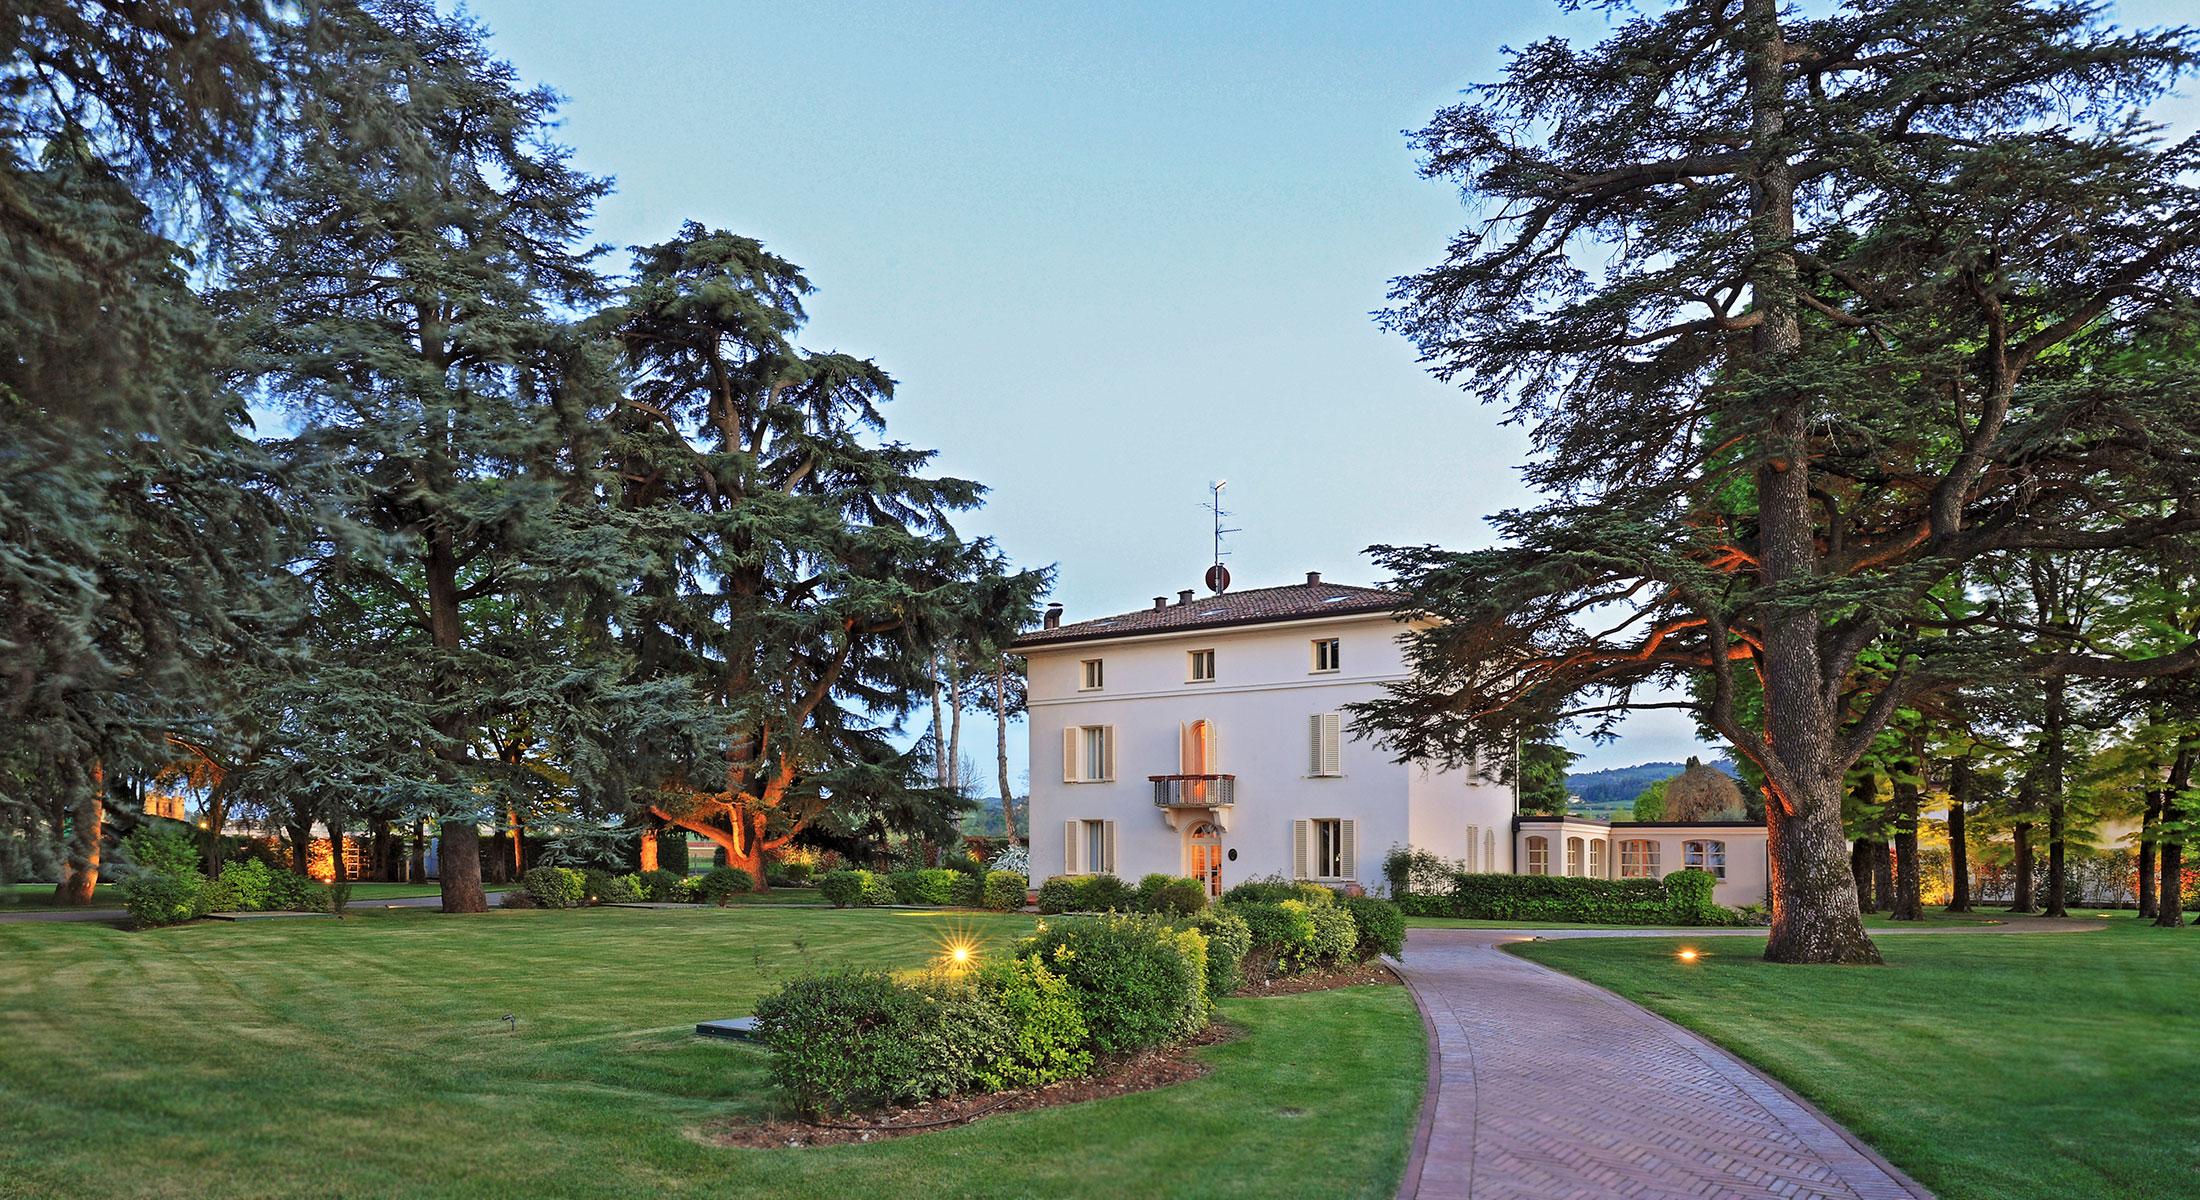 Hotel Bologna Spa